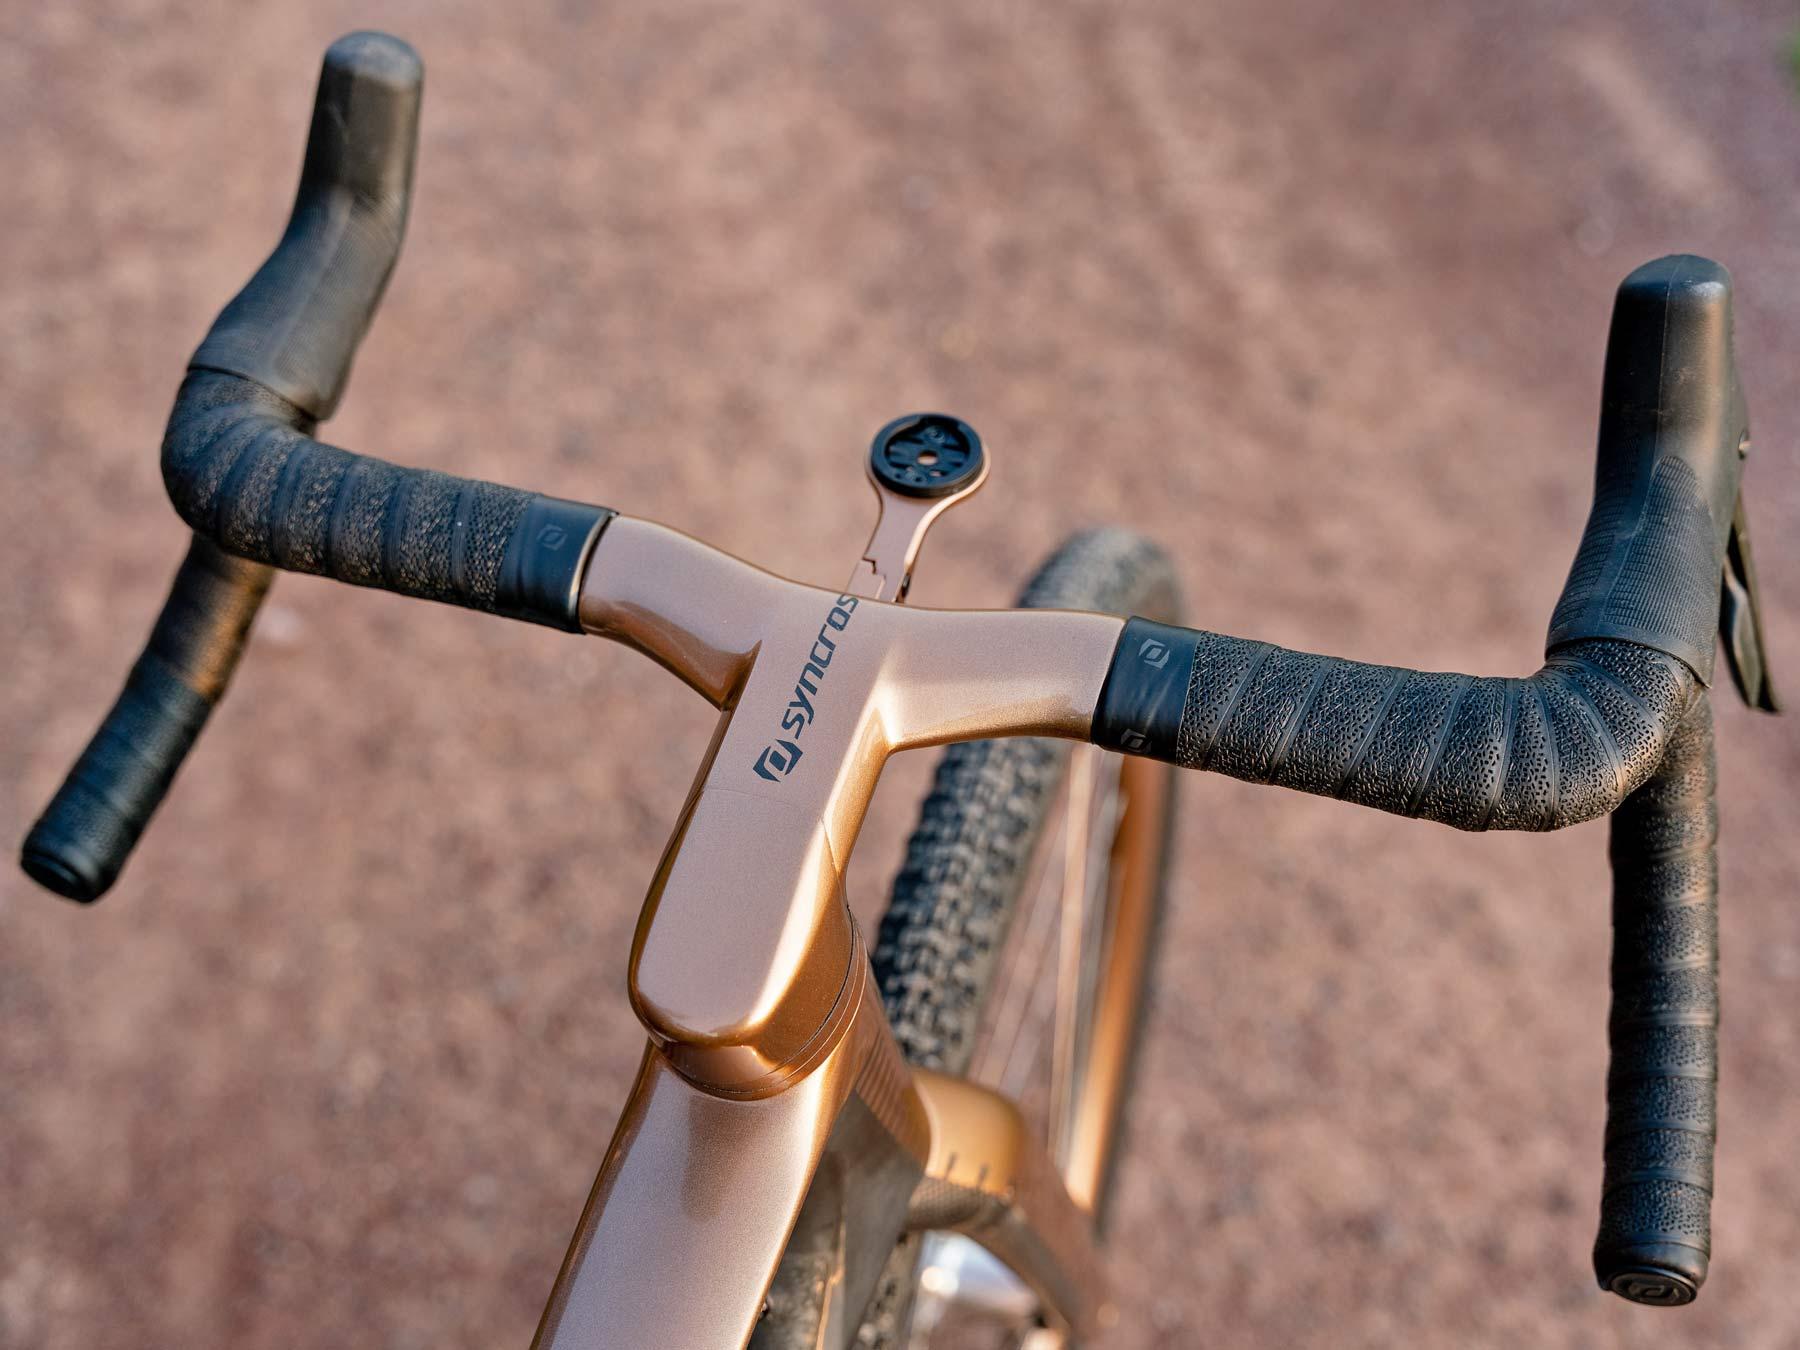 custom Scott Addict Gravel Tuned Dangerholm edition lightweight carbon prototype gravel bike project,Syncros iC SL cockpit